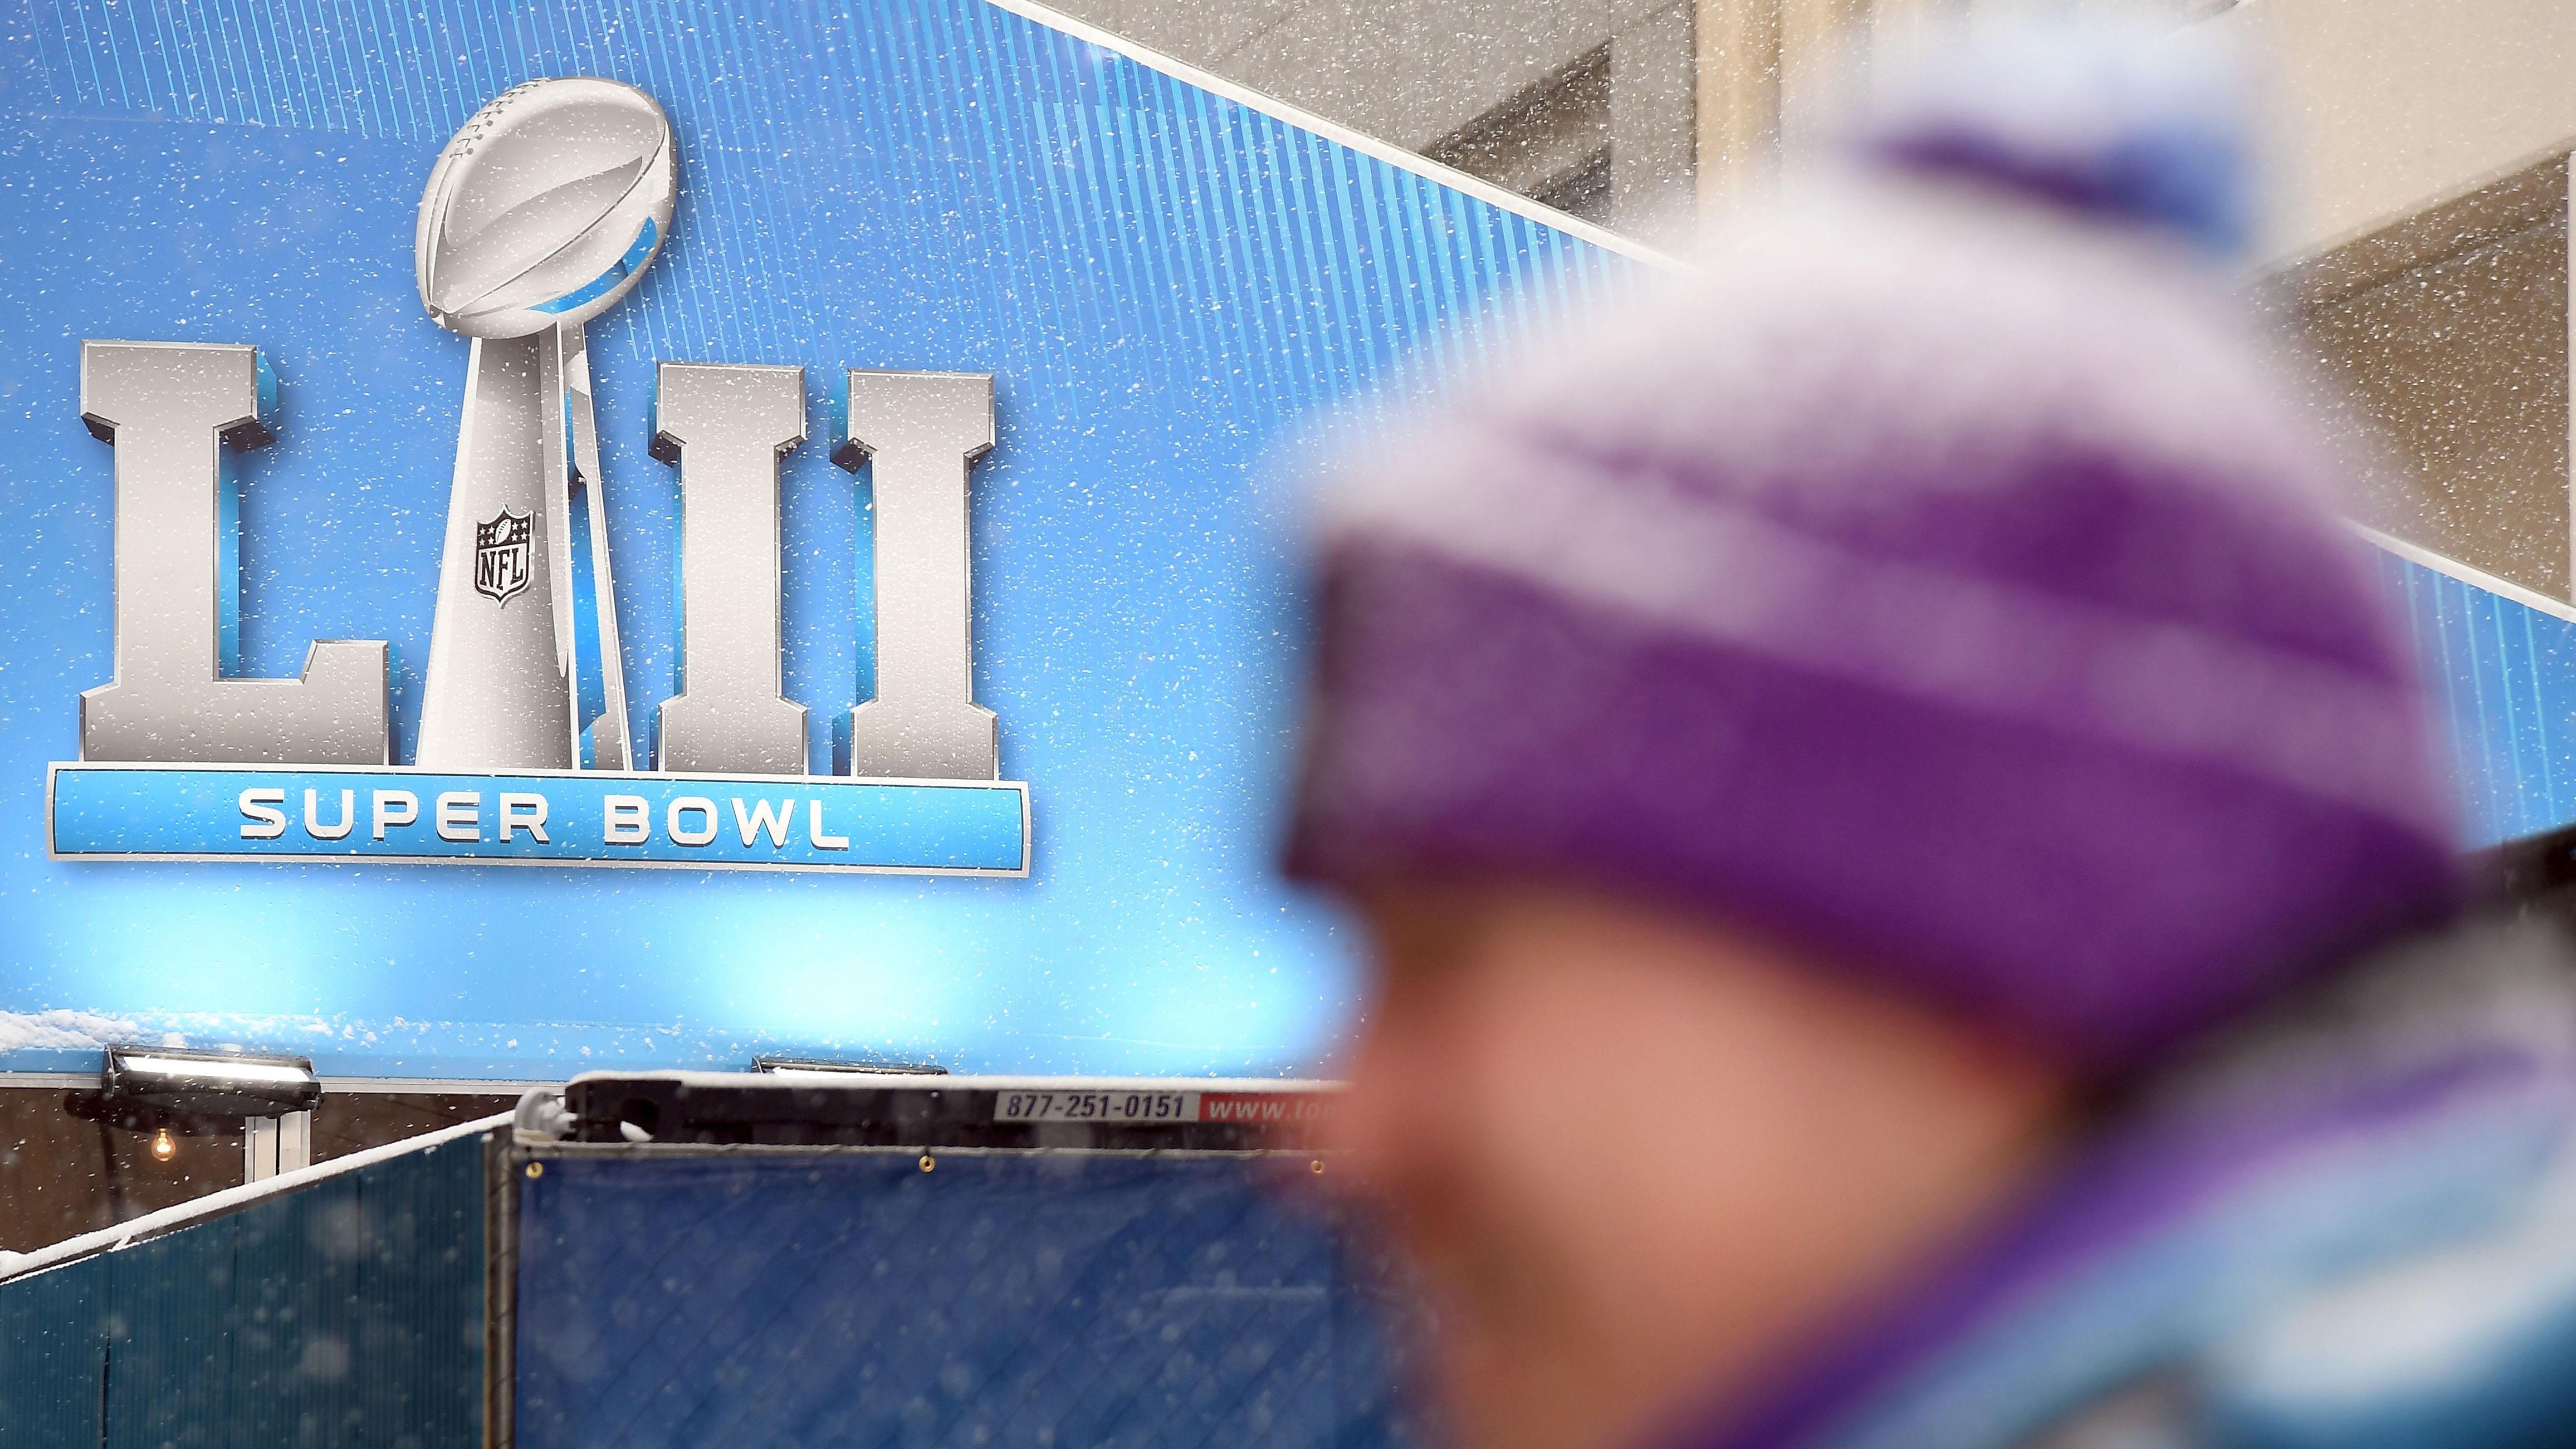 BBDO CEO Sees More Fun, Less Politics in Super Bowl Ads